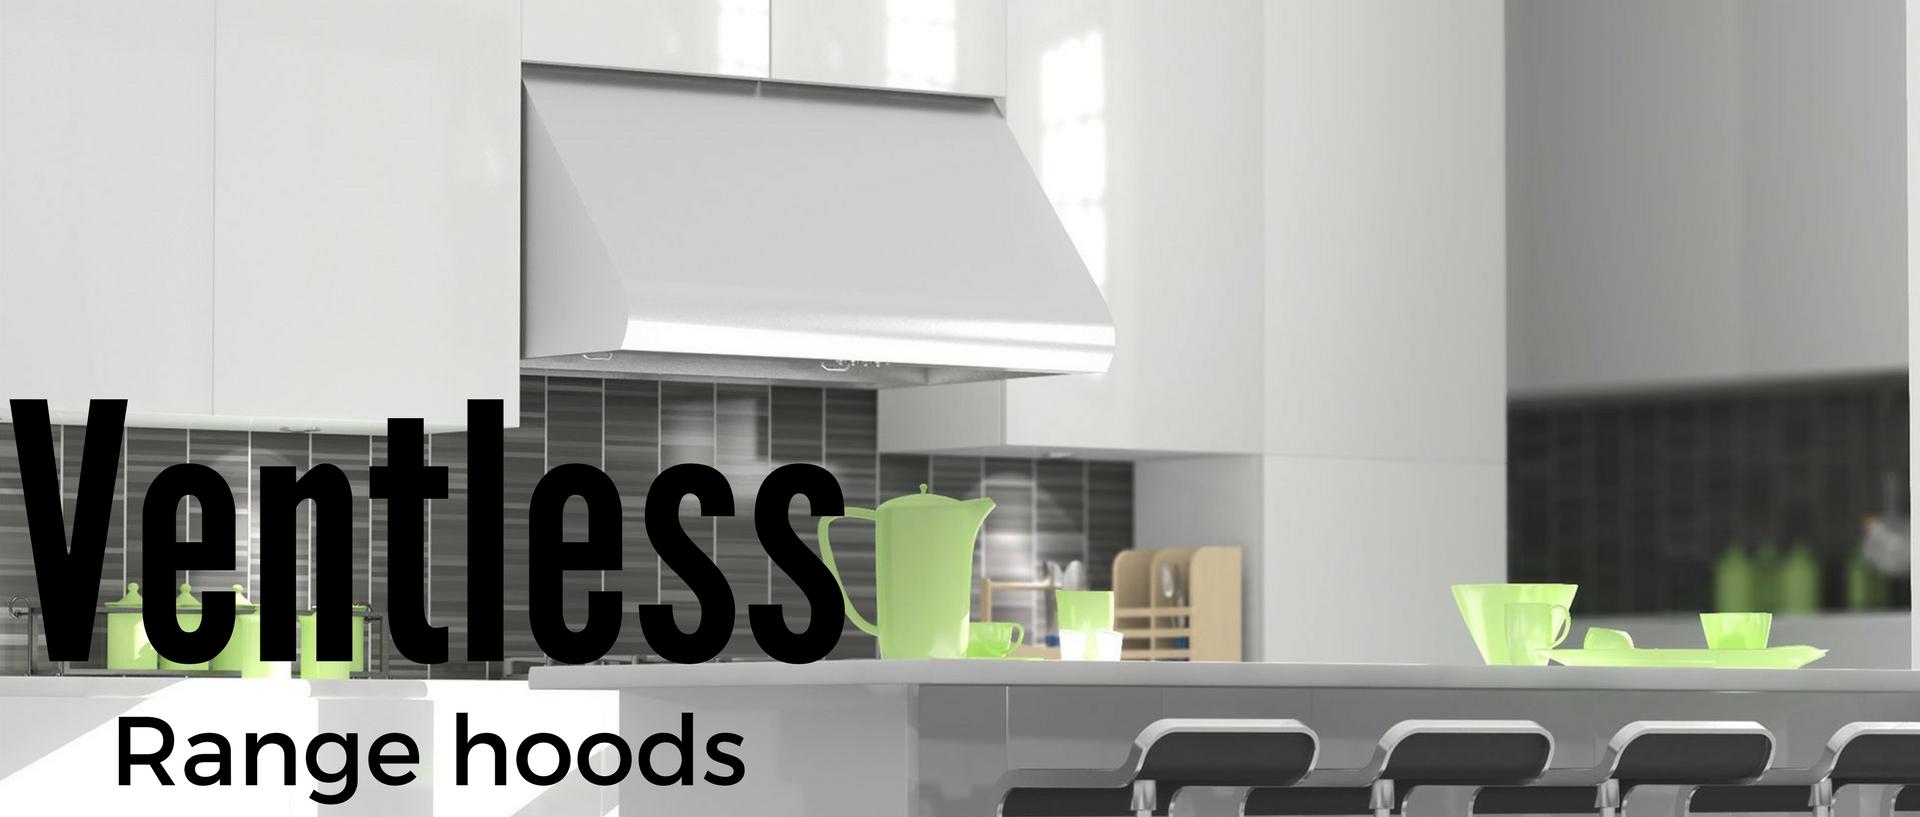 Vented Vs. Ventless Range Hoods | Appliances Connection